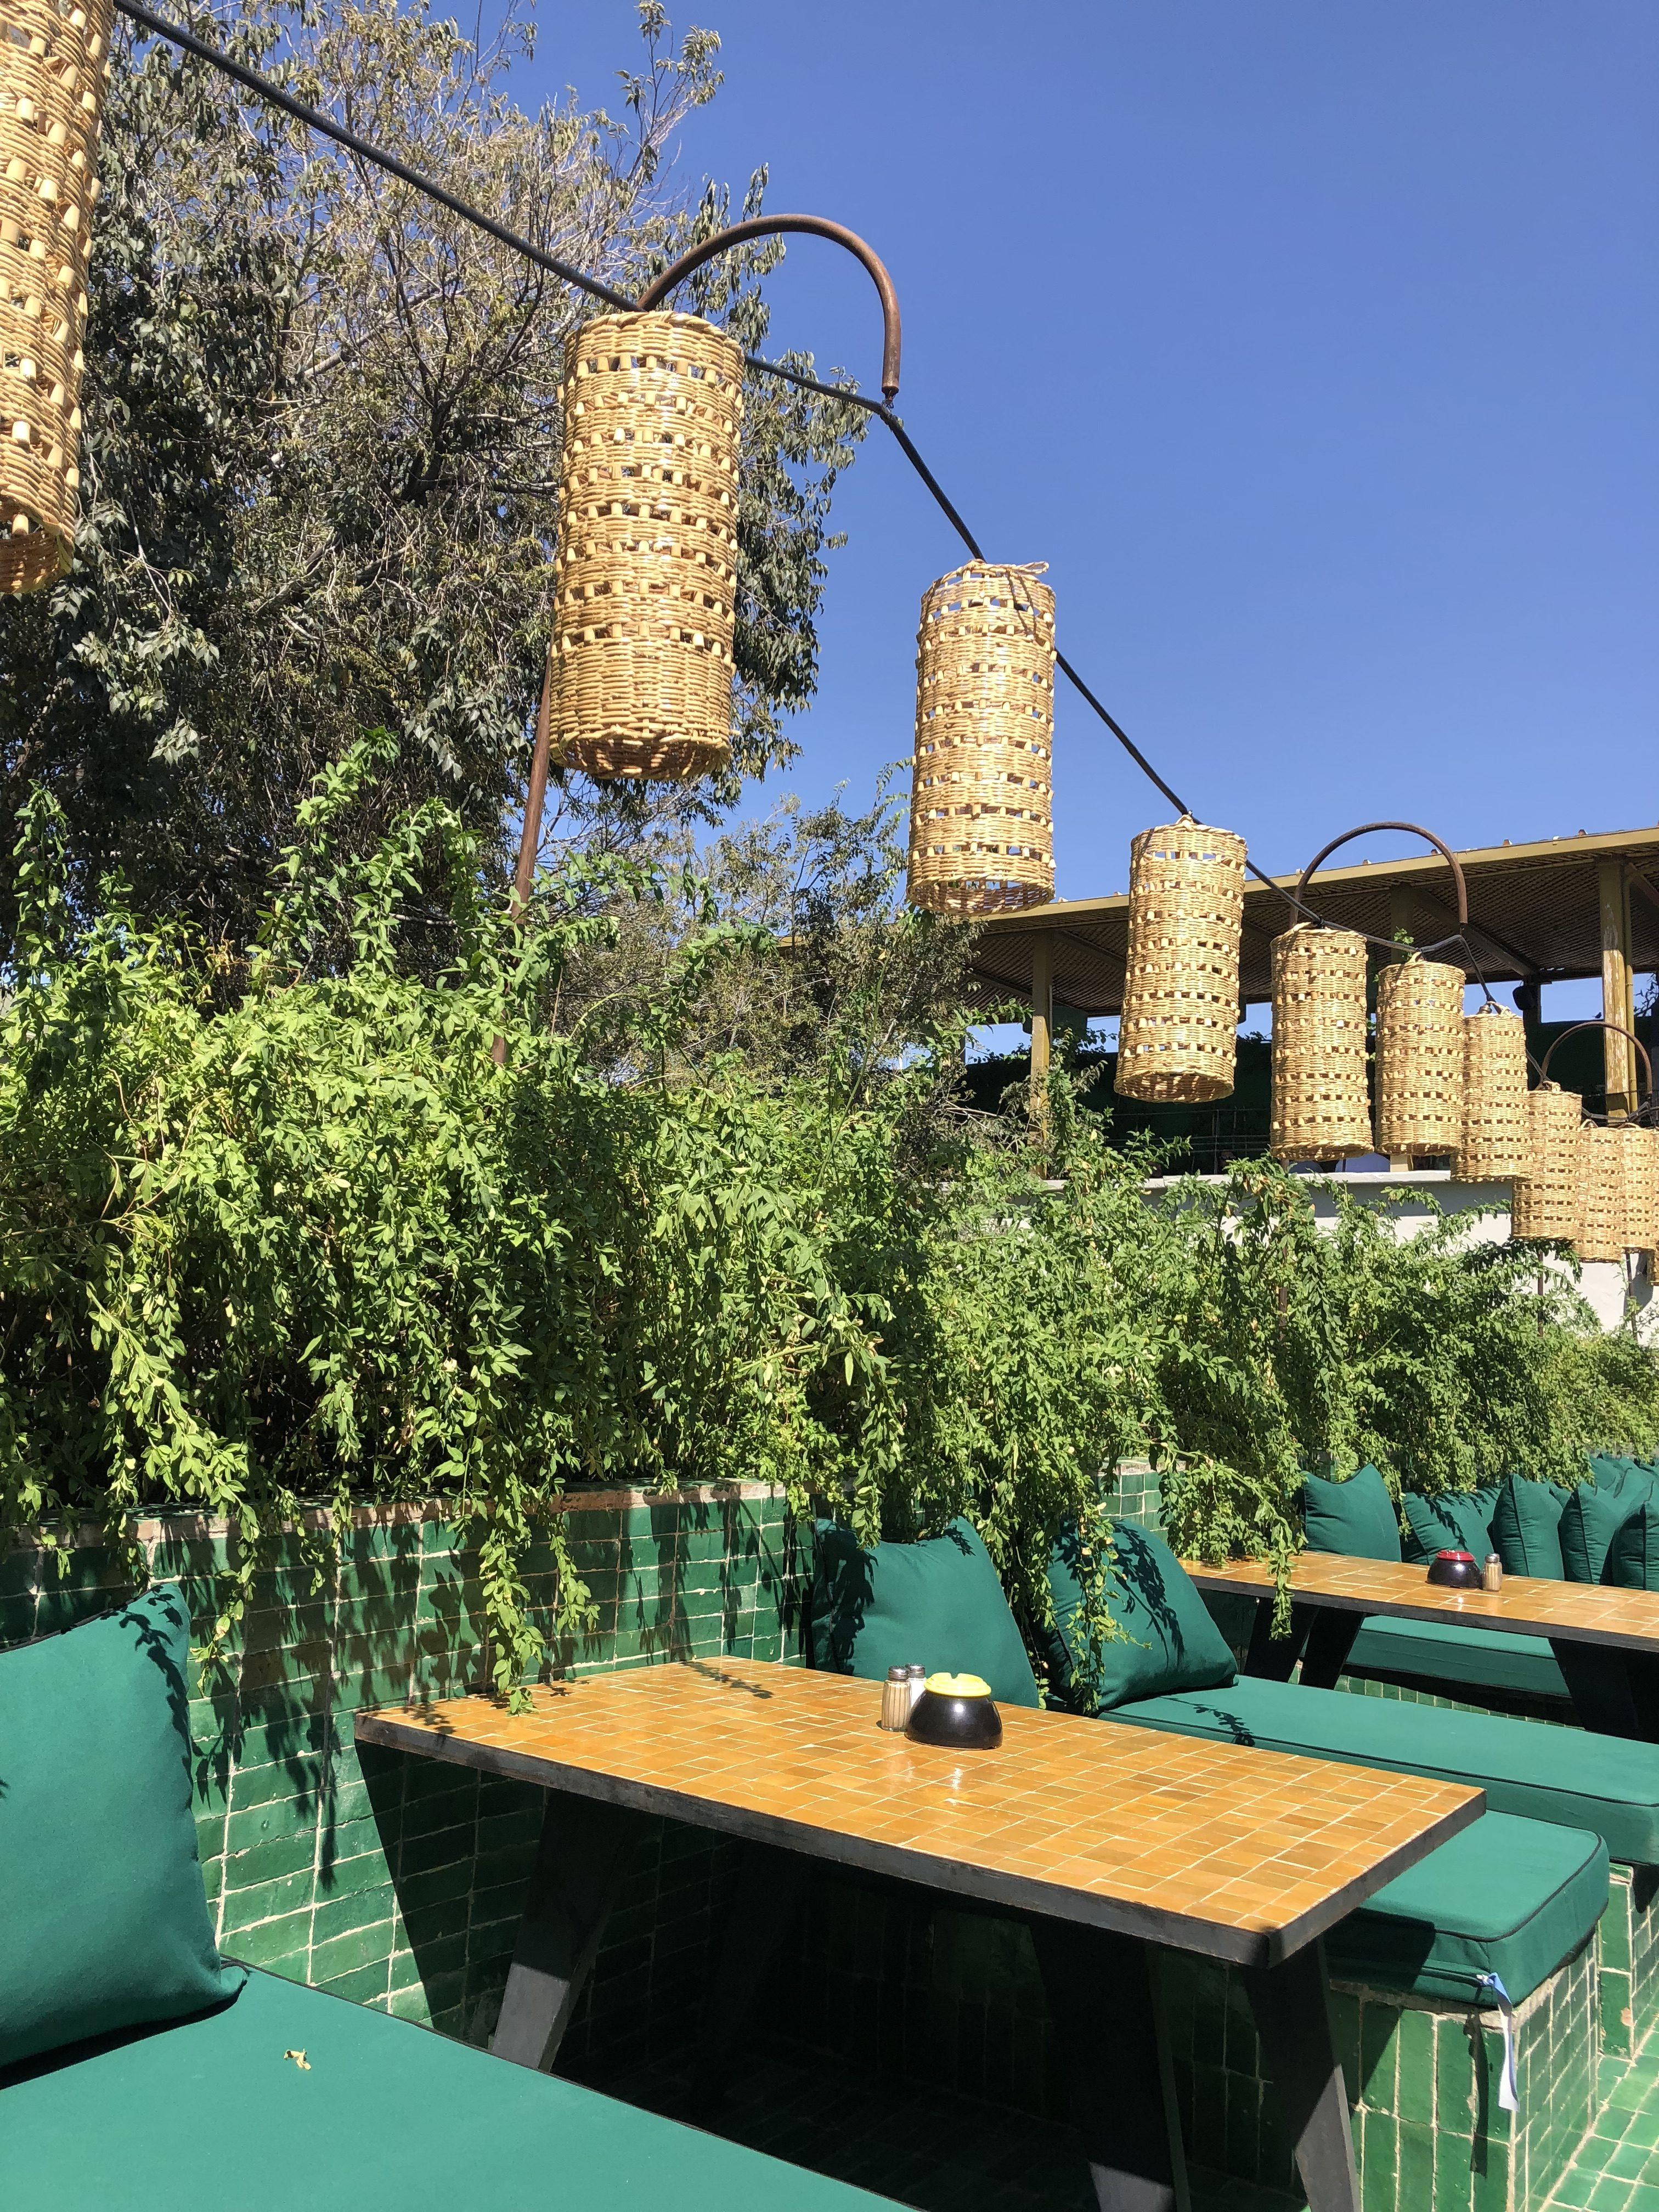 le-jardin-dejeuner-marrakech